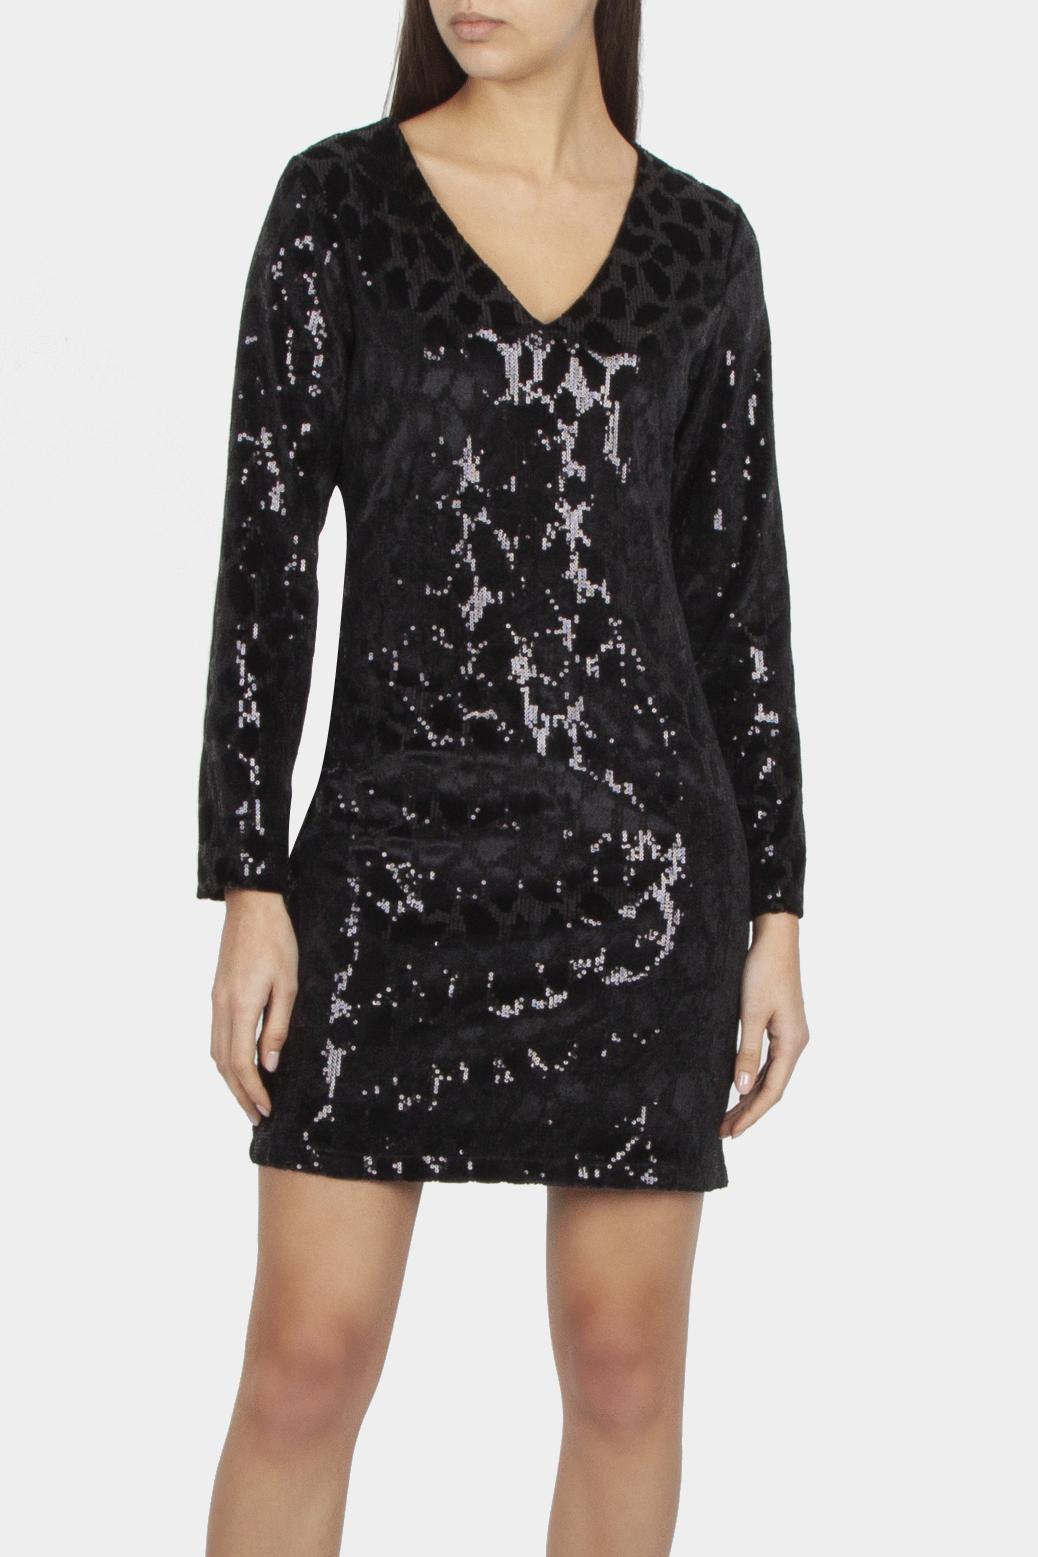 Sequined velour dress